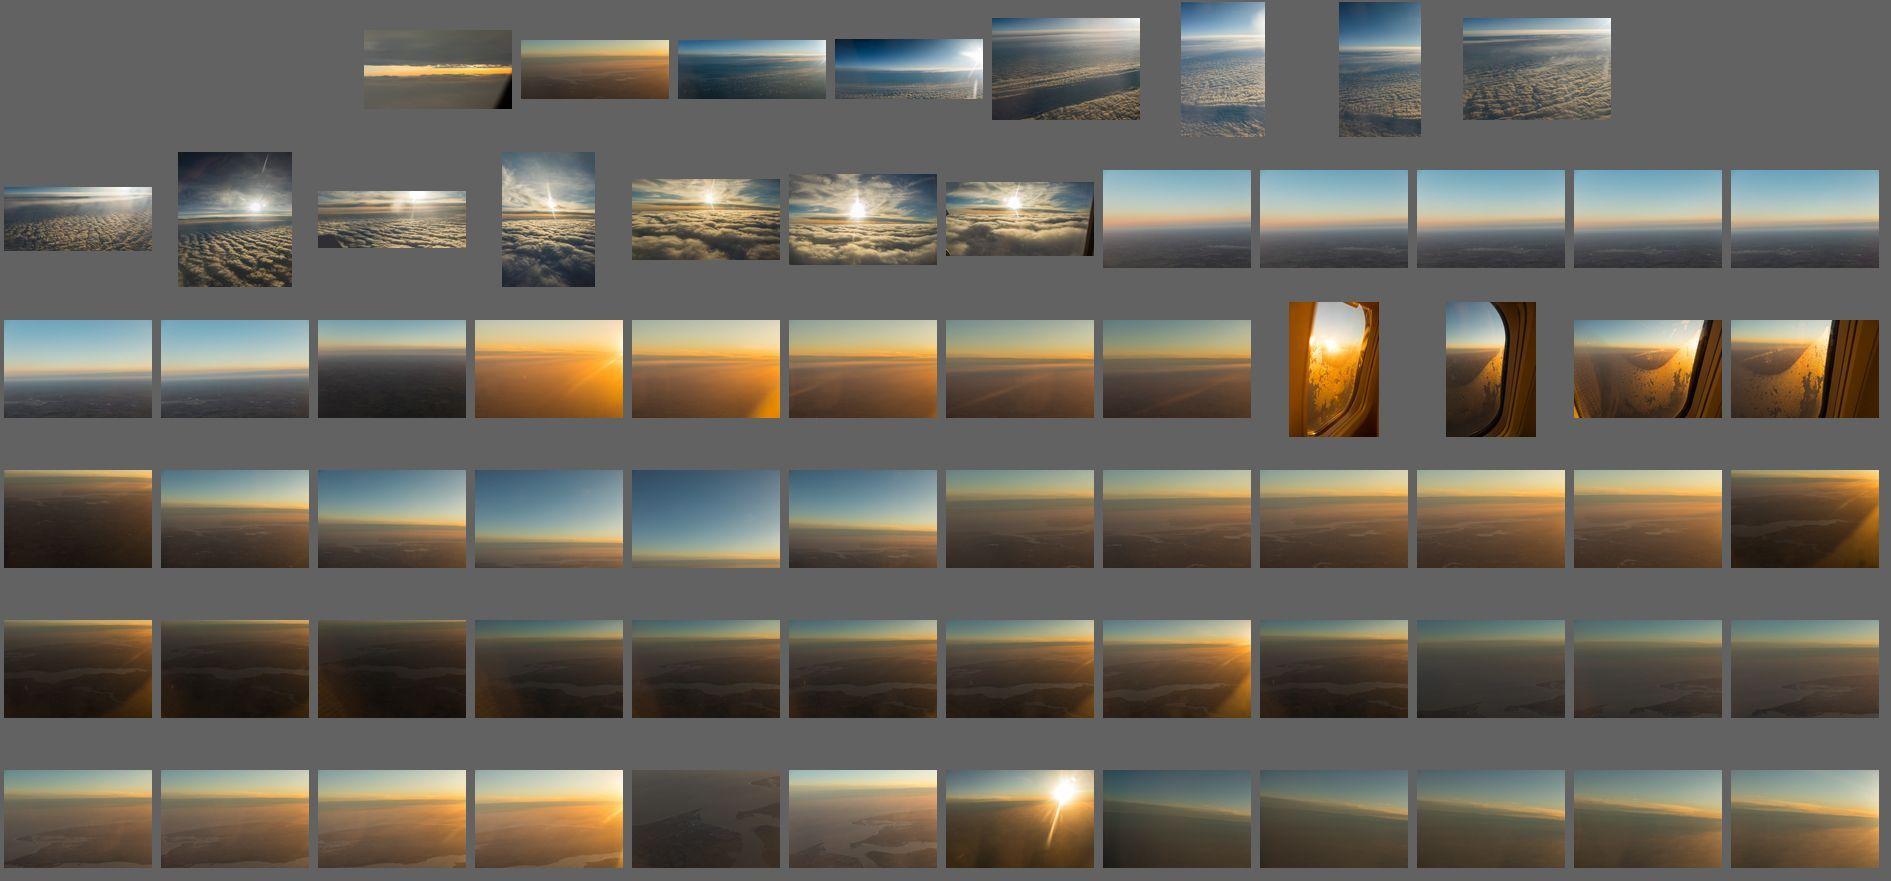 دانلود عکسآسمانابری پانوراما Aerial Clouds vol.7